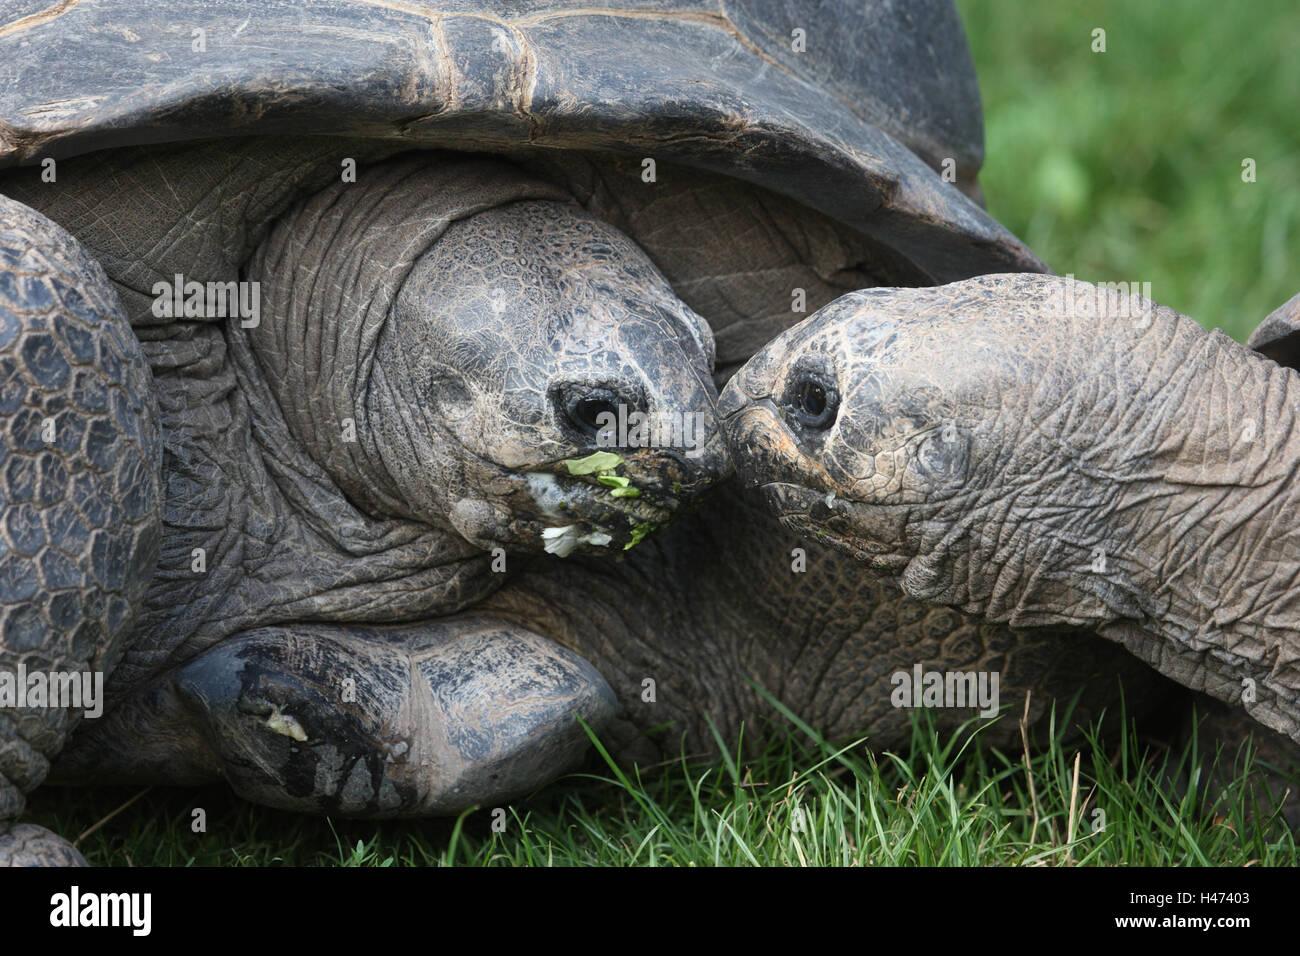 The Seychelles gigantic tortoises, - Stock Image